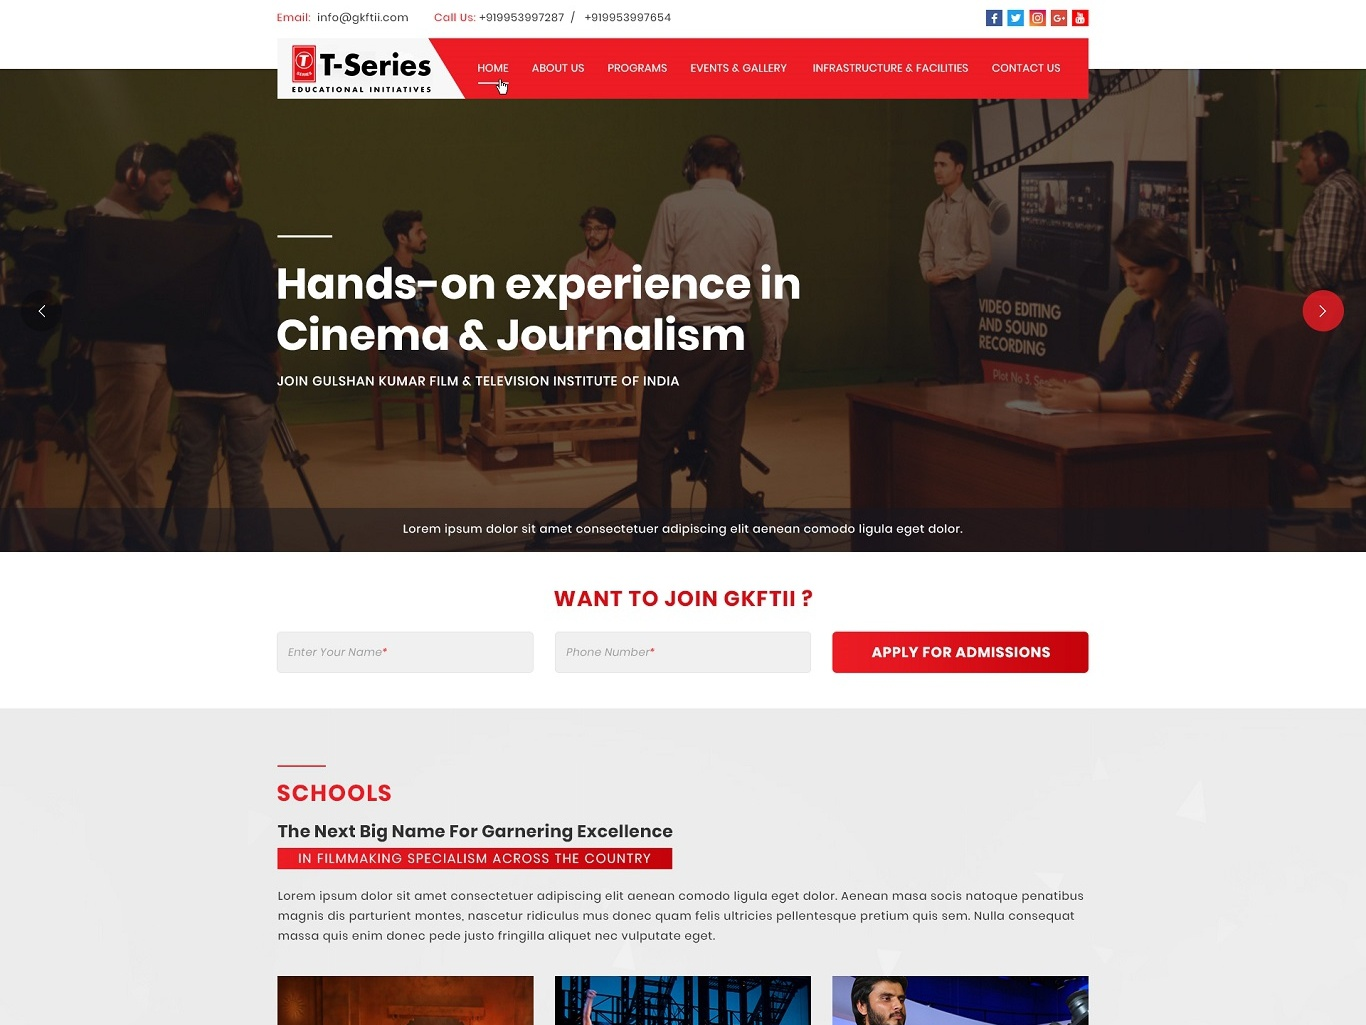 Website Design + Website Development For GKFTII (T-Series ...